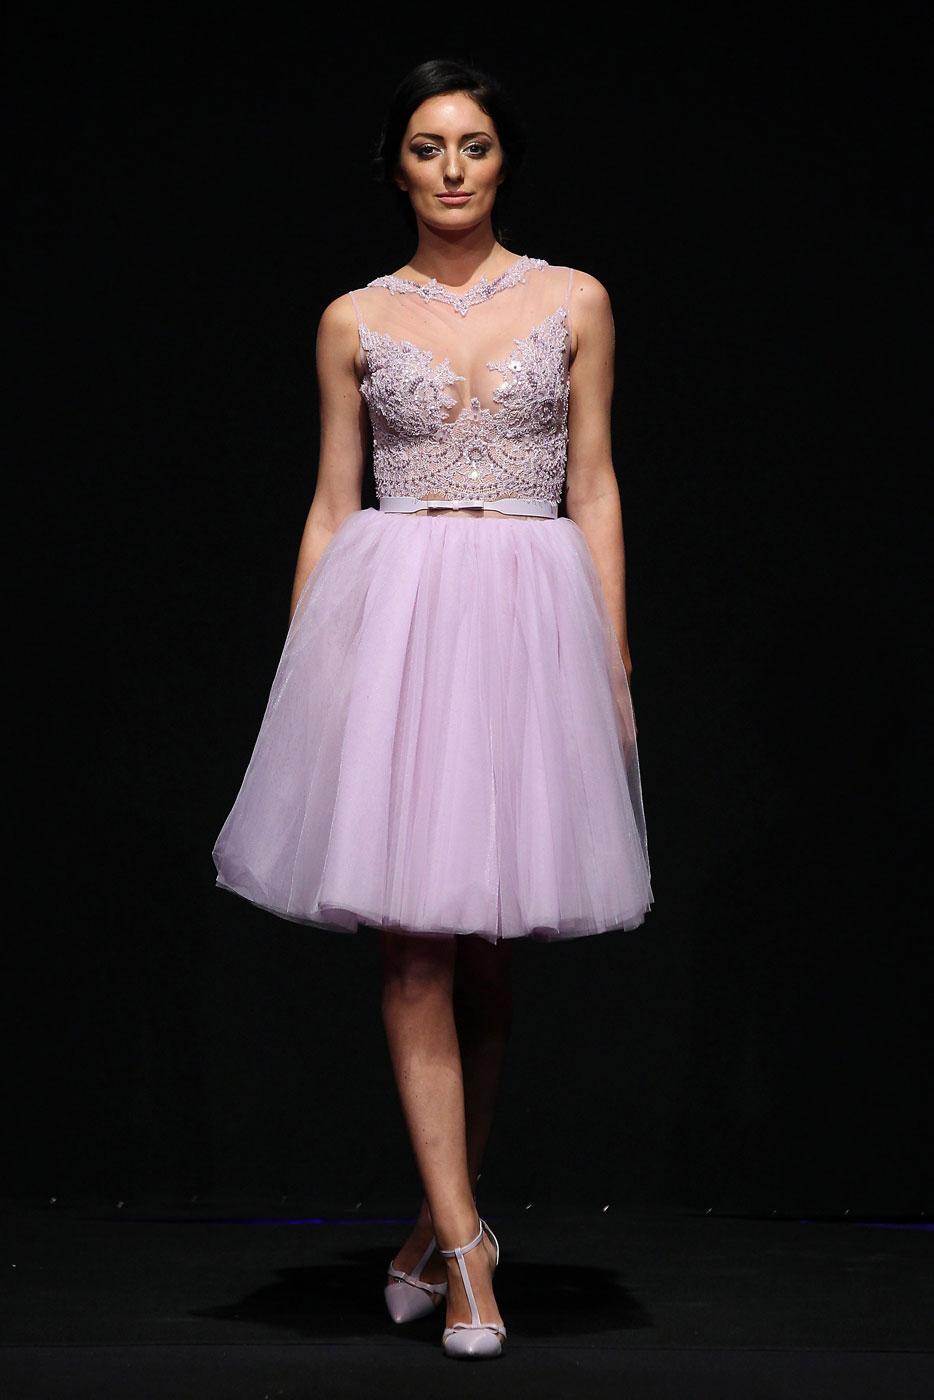 Abed-Mahfouz-fashion-runway-show-haute-couture-paris-spring-2015-the-impression-11